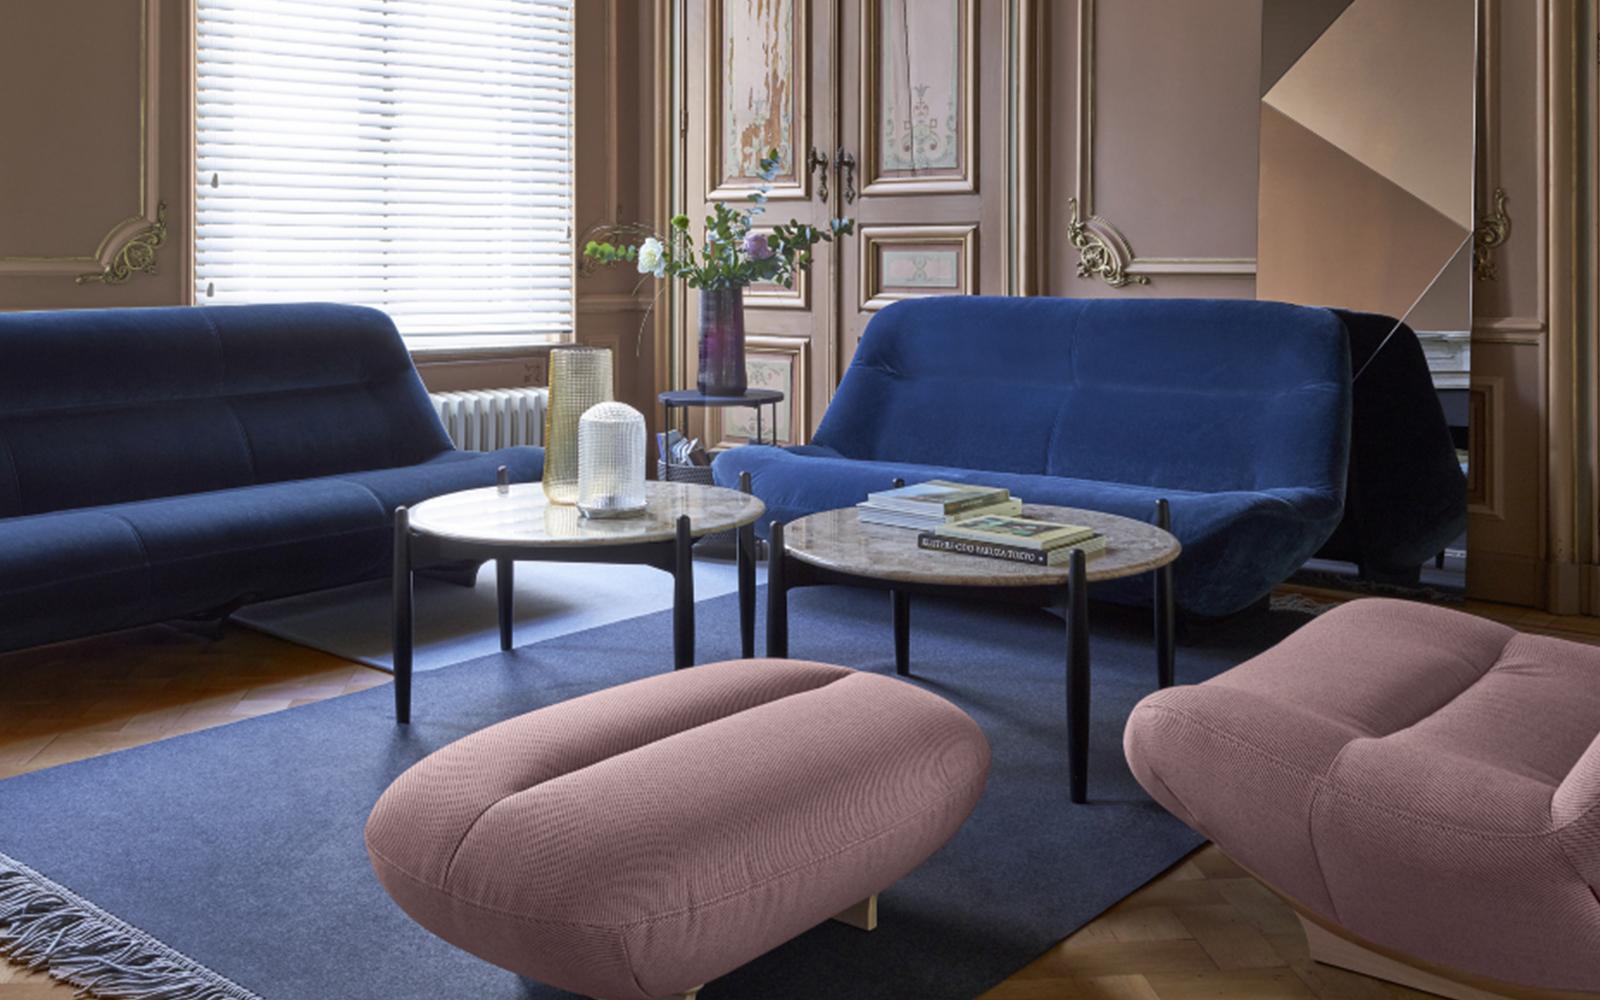 jeu concours canap manarola gagner changez de meubles. Black Bedroom Furniture Sets. Home Design Ideas